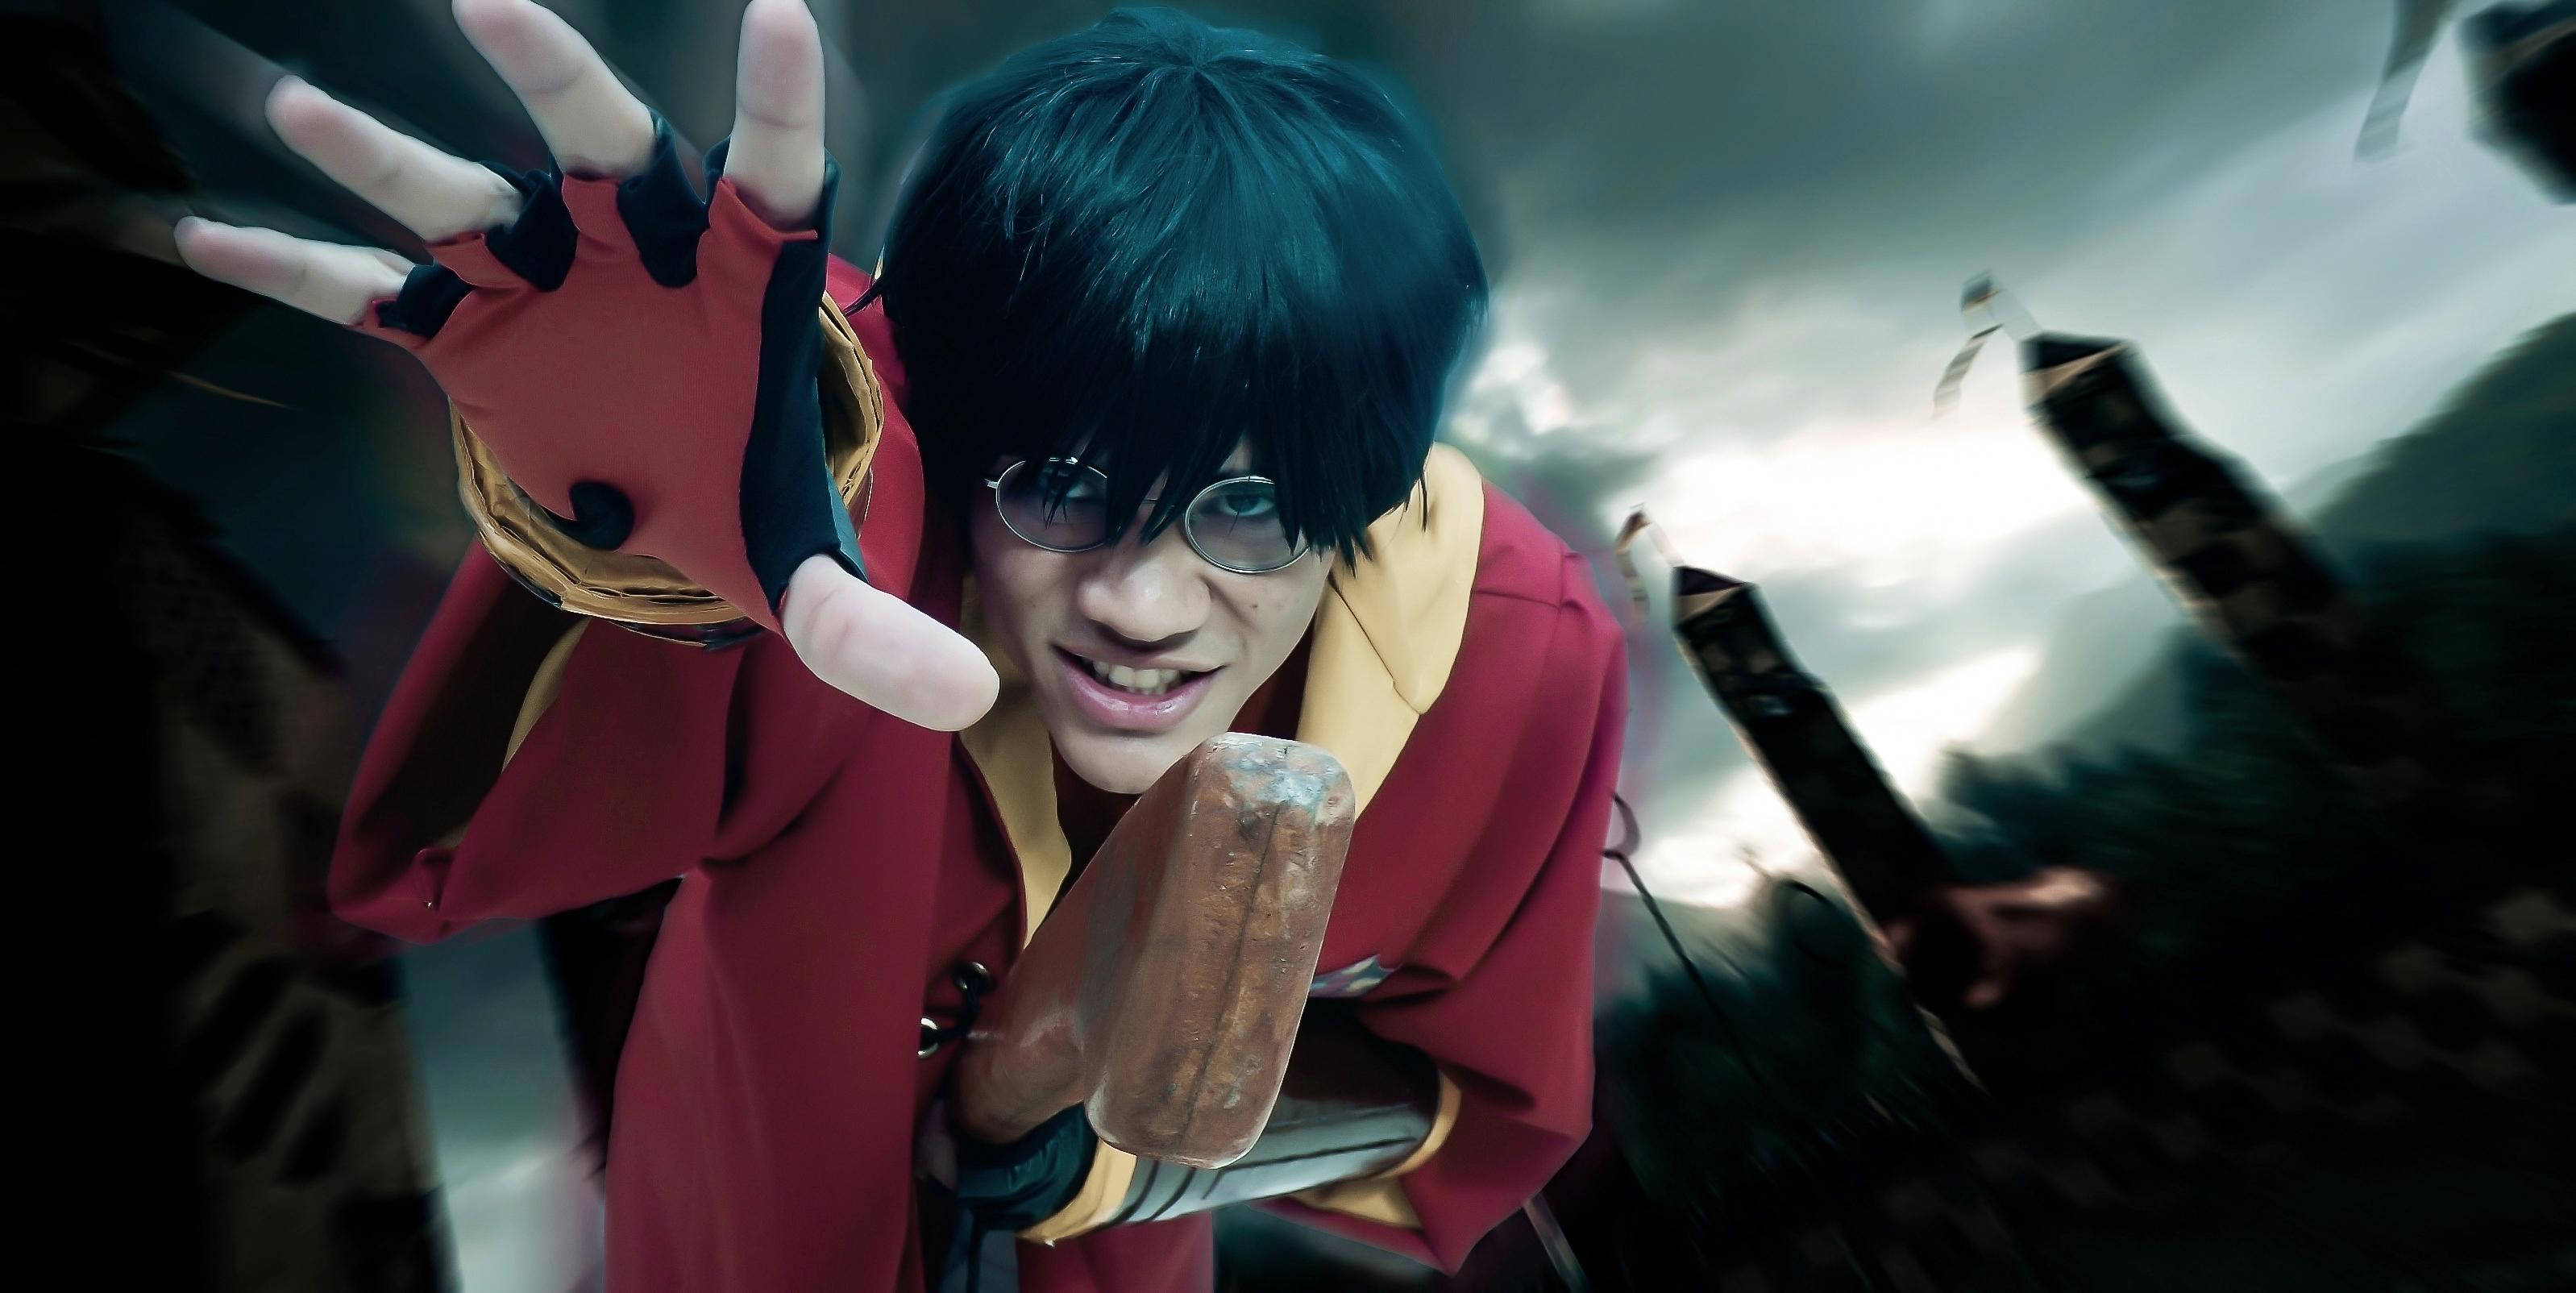 Harry Potter - Gryffindor Seeker VI by DashingTonyLima